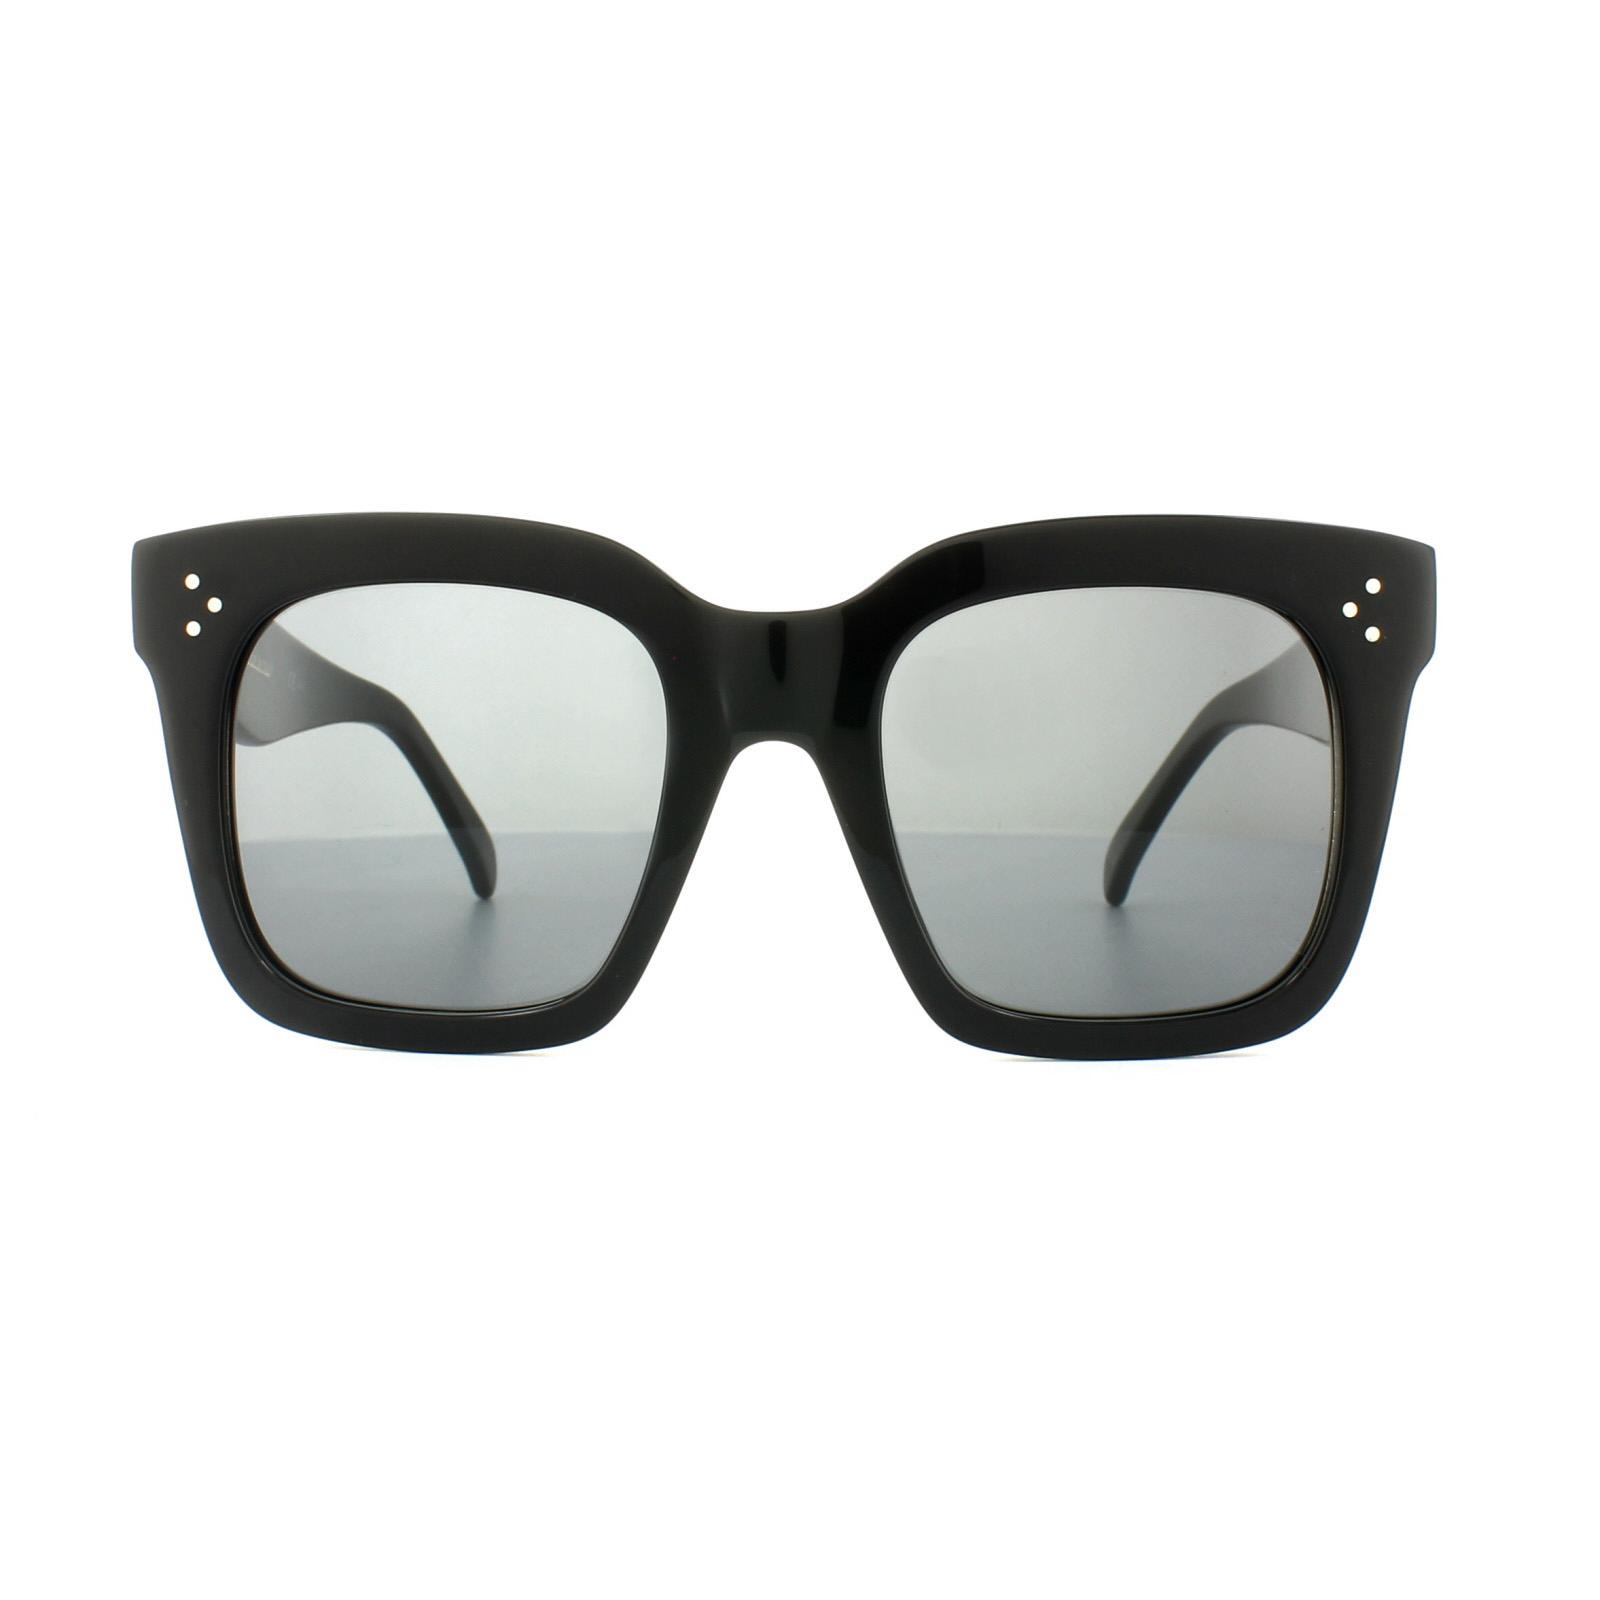 48c060862a04 ... Celine Sunglasses 41076/S Tilda 807 BN Black Dark Grey Thumbnail 2 ...